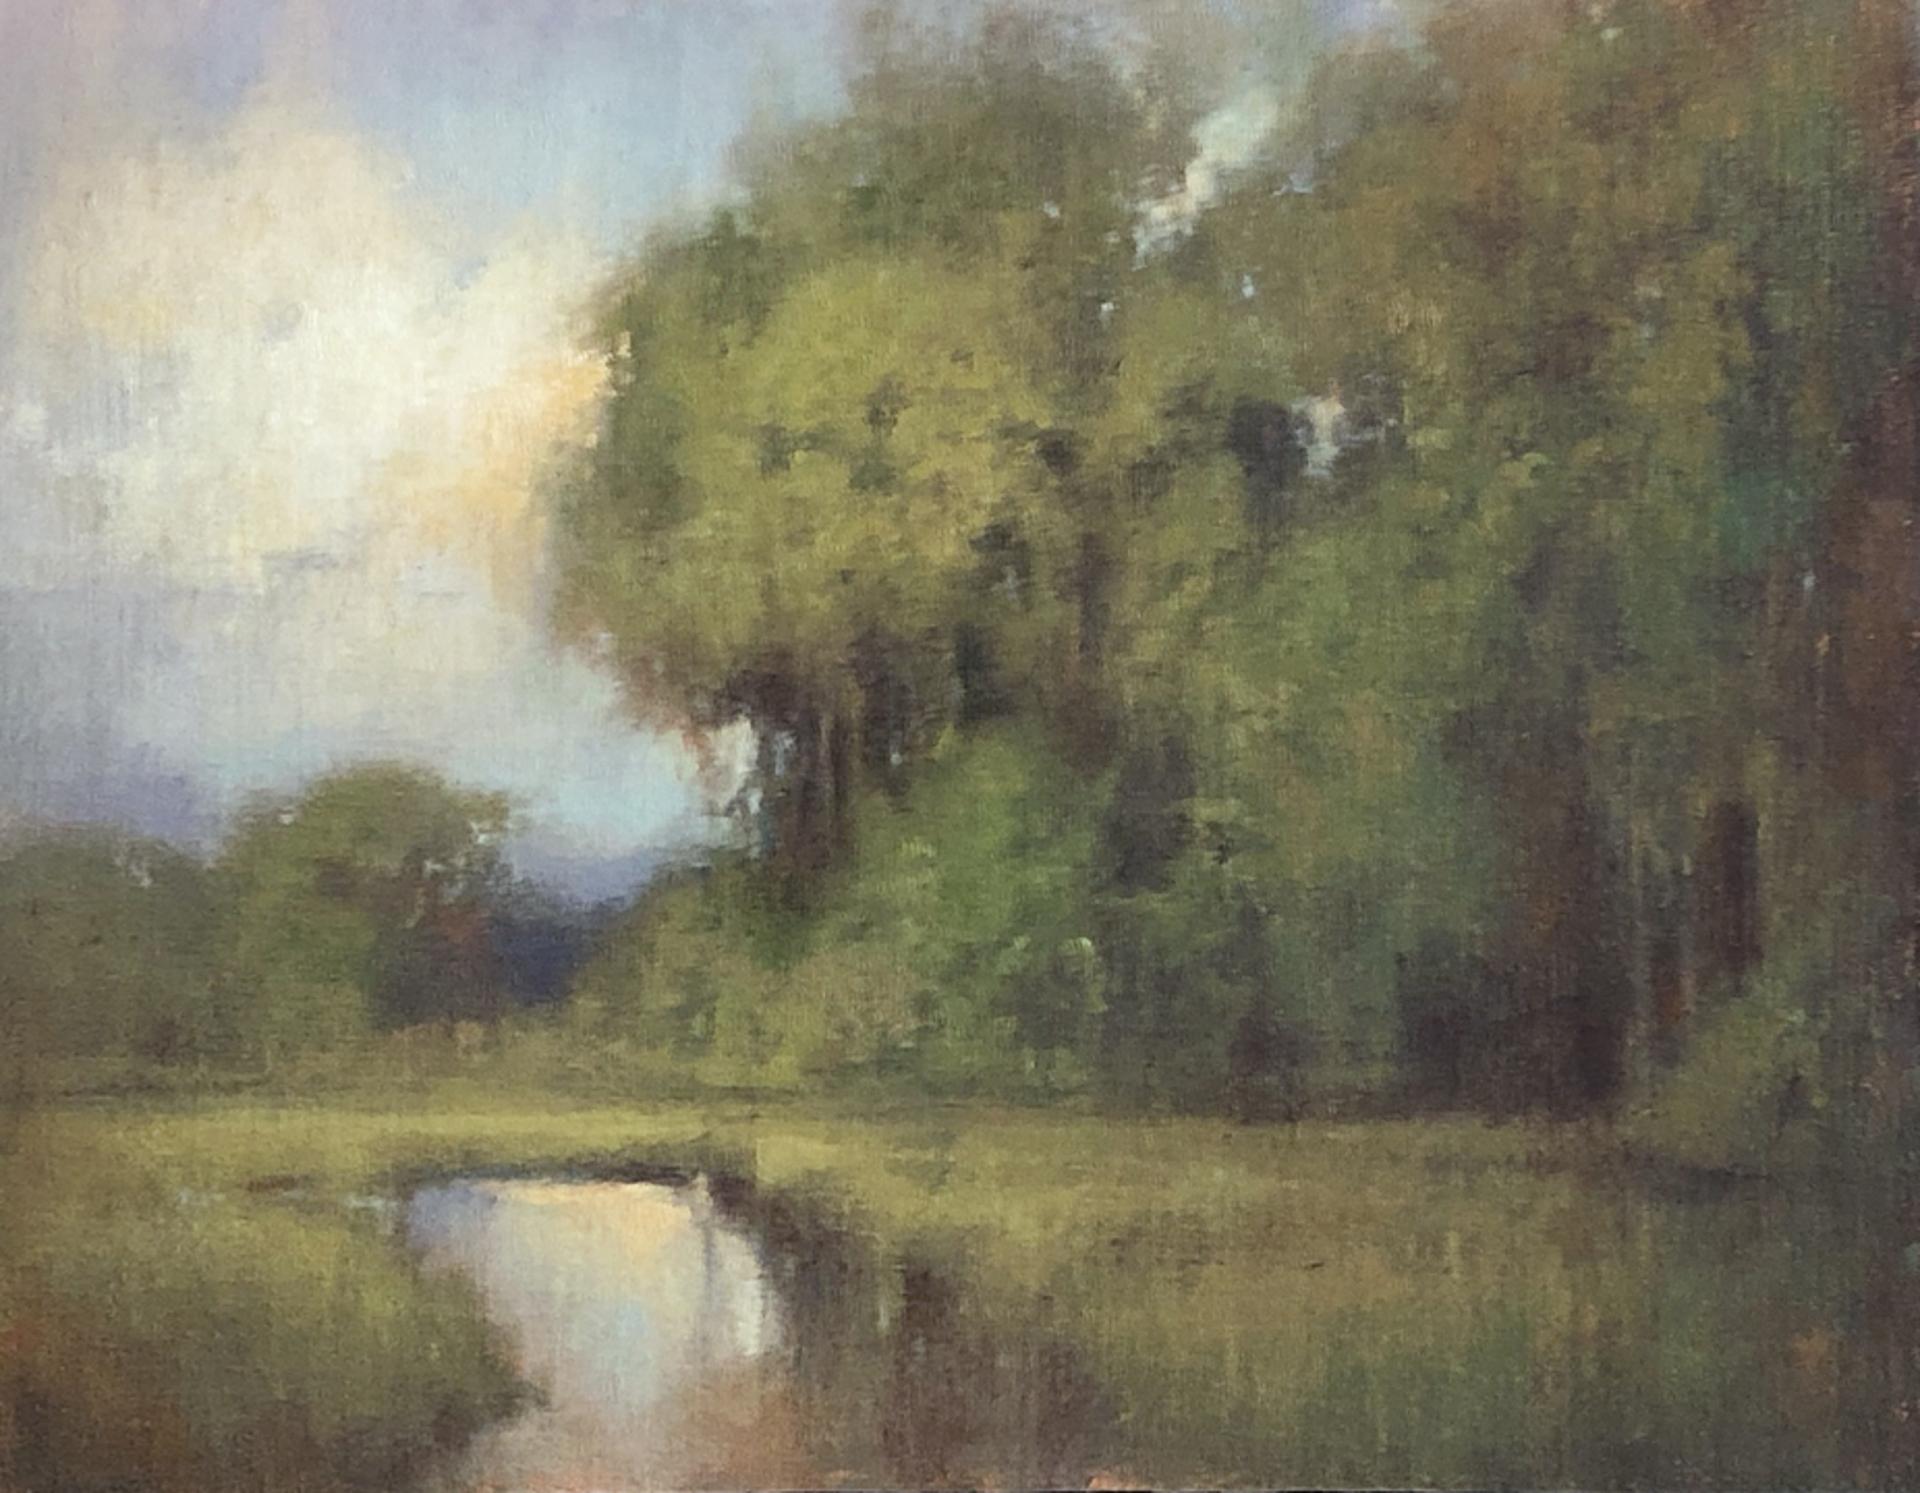 Shifting Seasons by Chris Groves